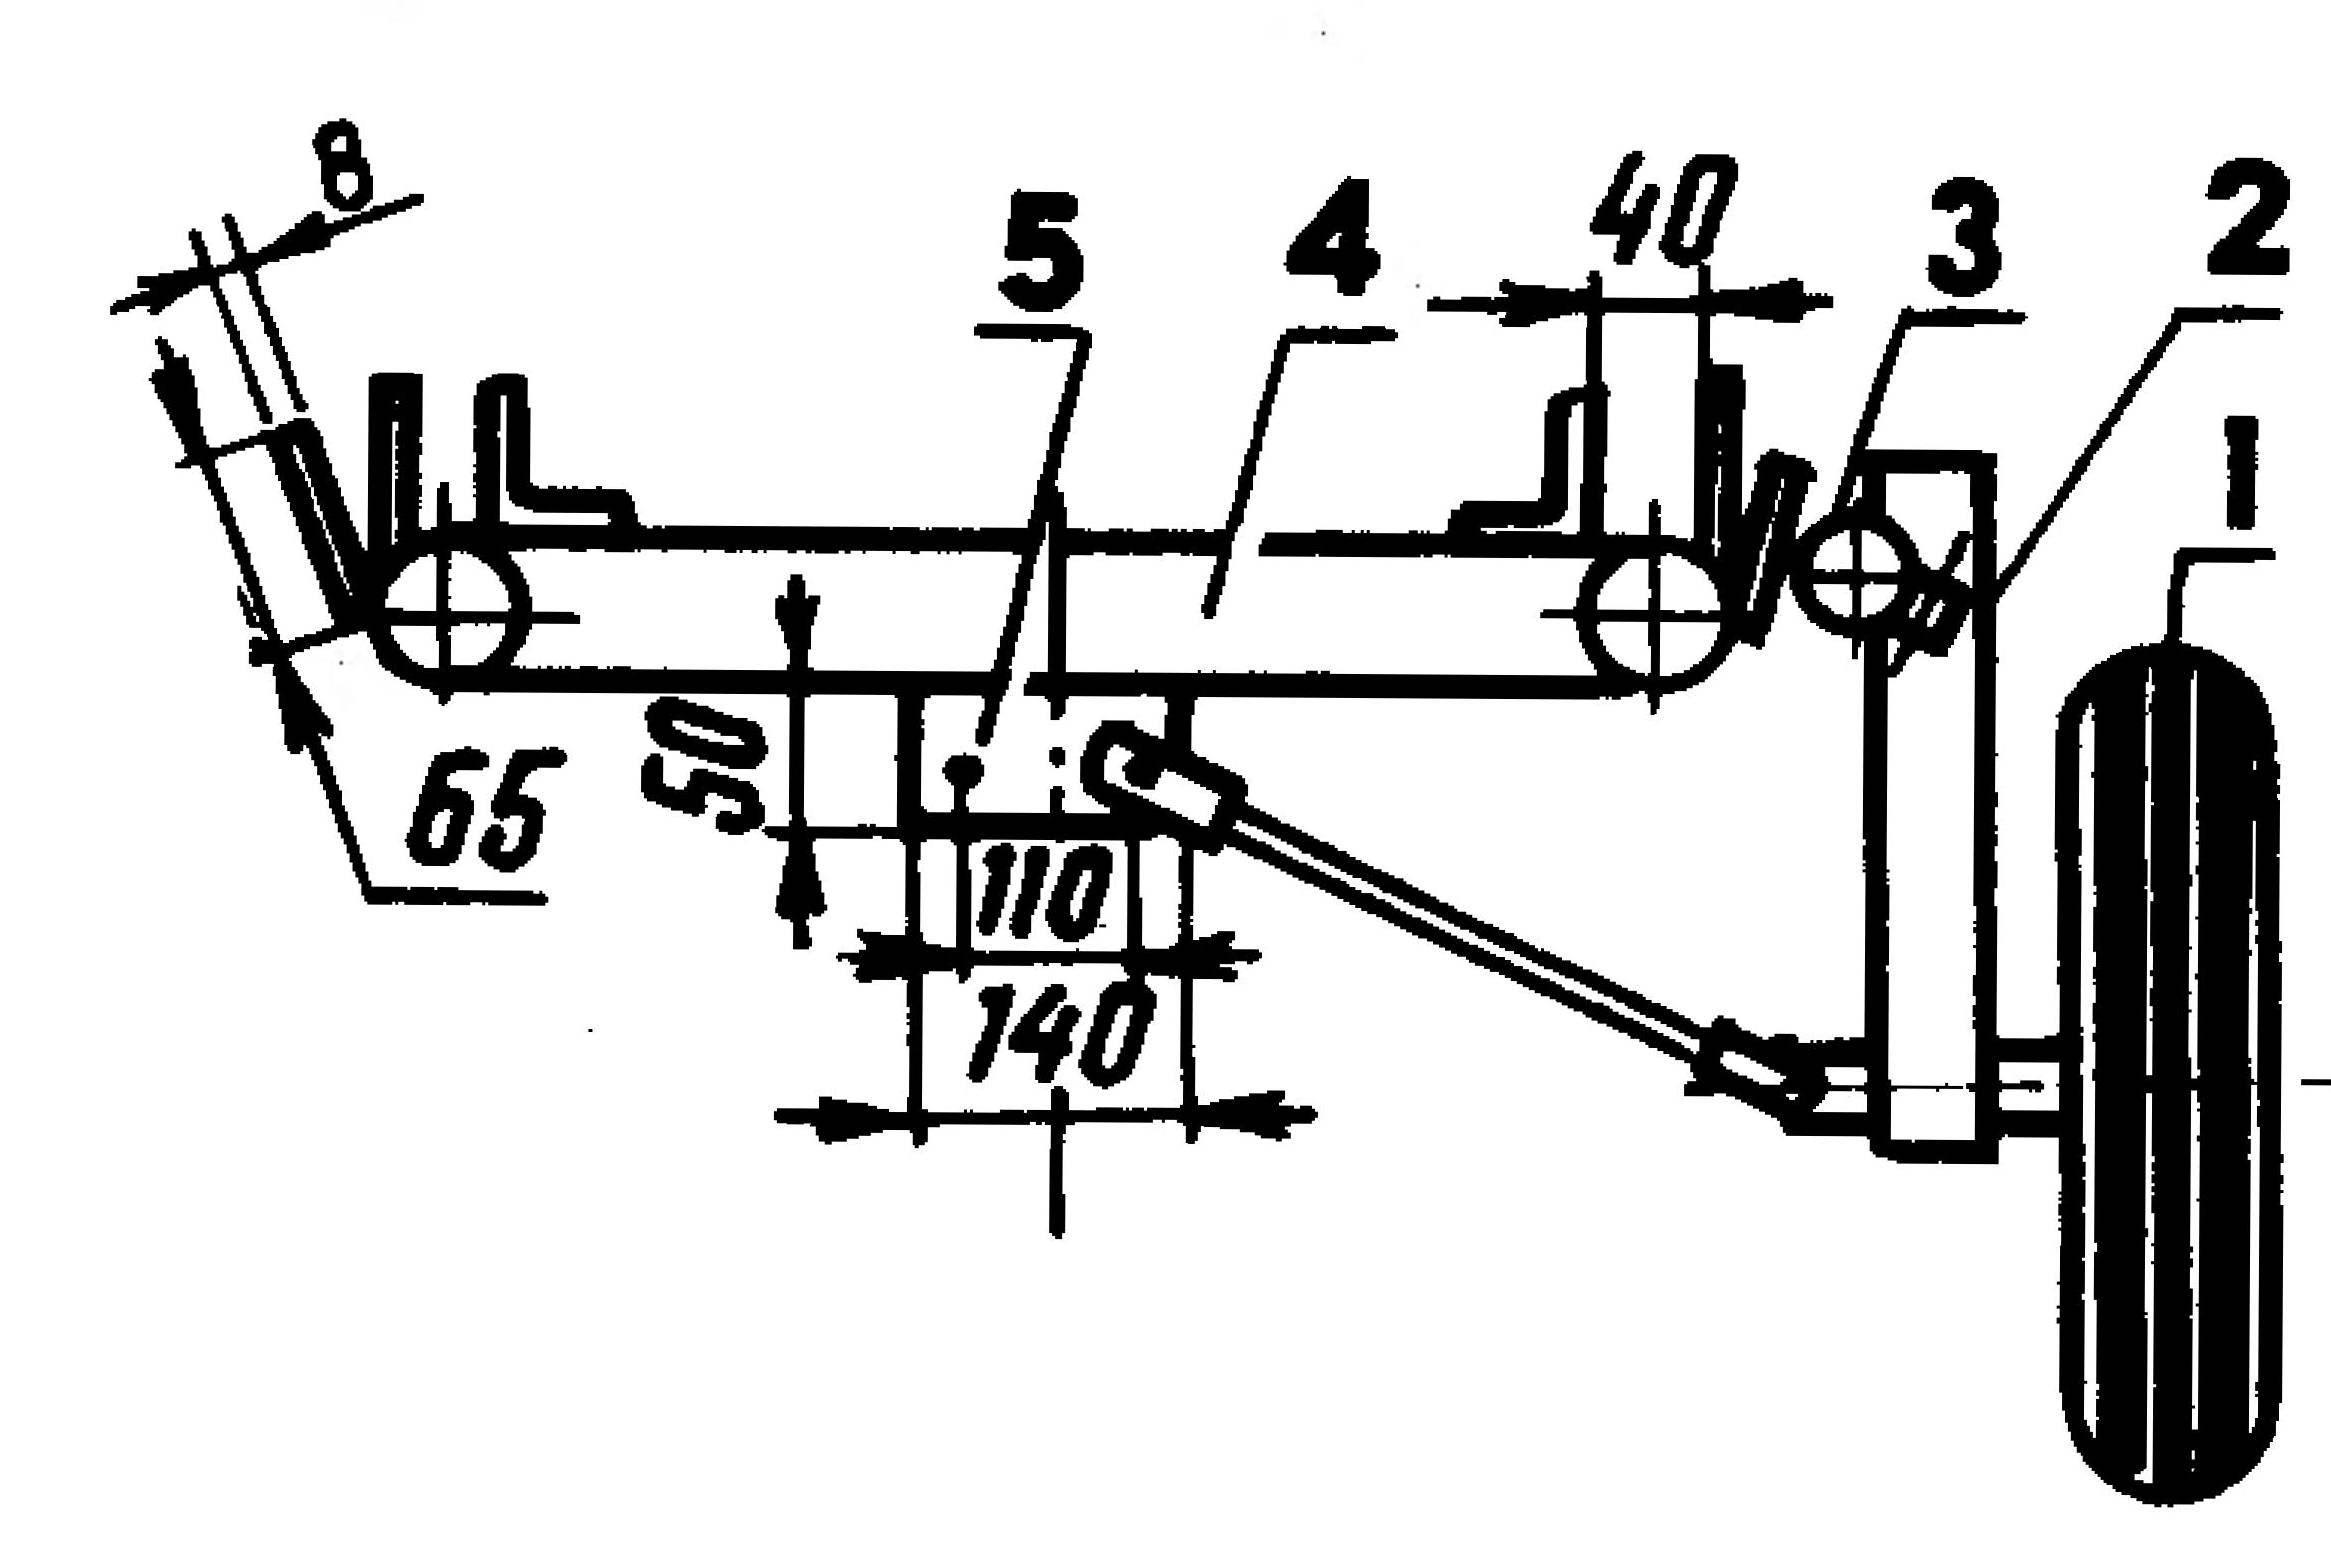 2. Колесо тележки-прицепа в сборе с подвеской